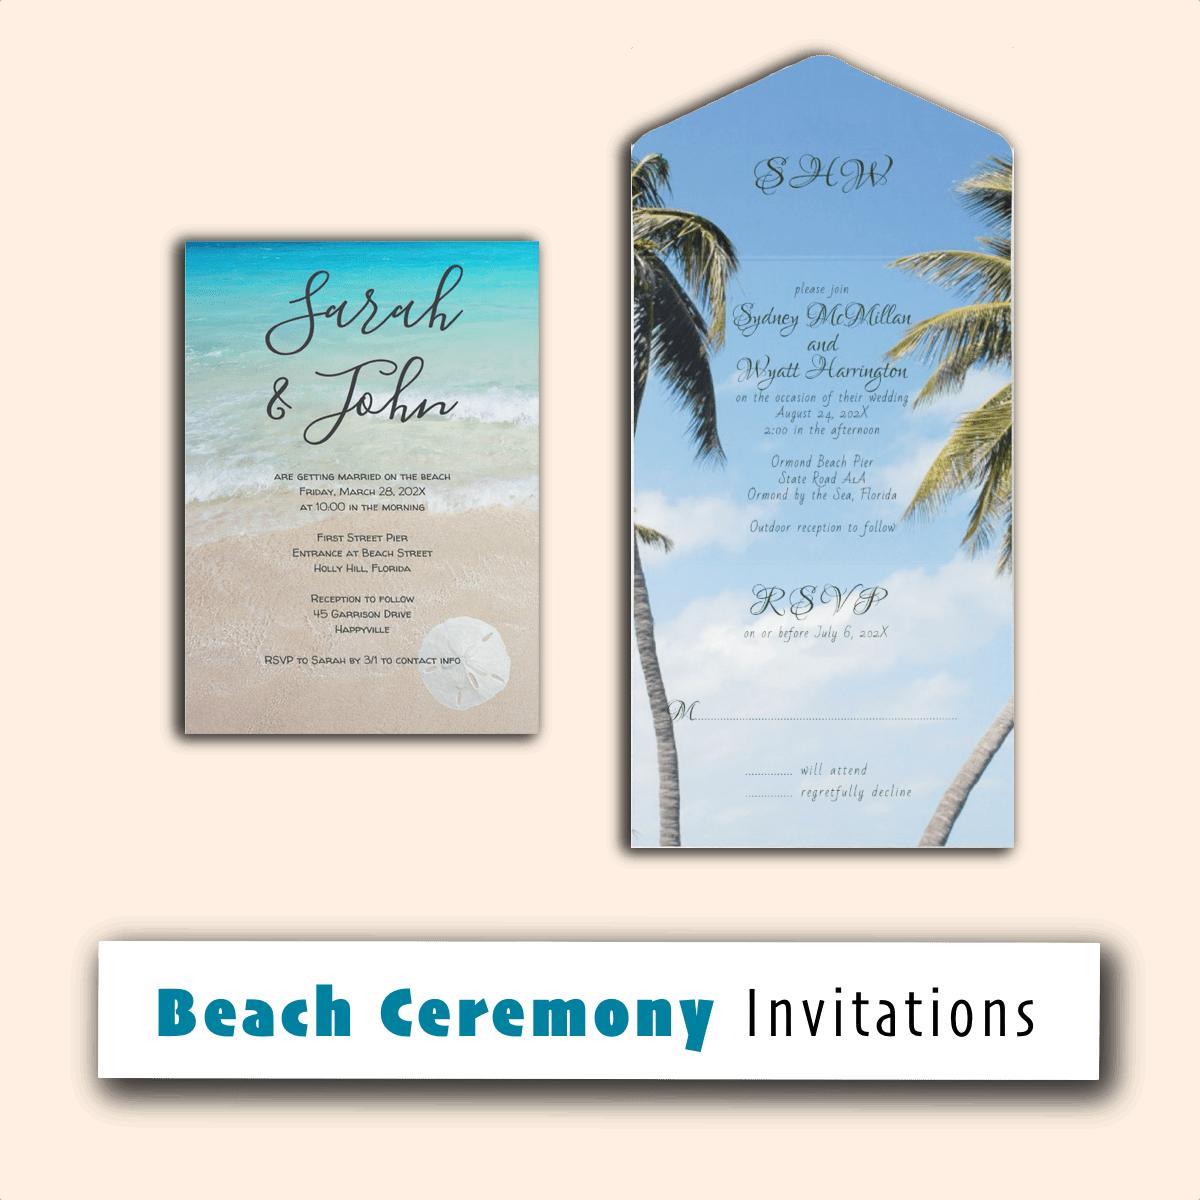 beach ceremony invitations